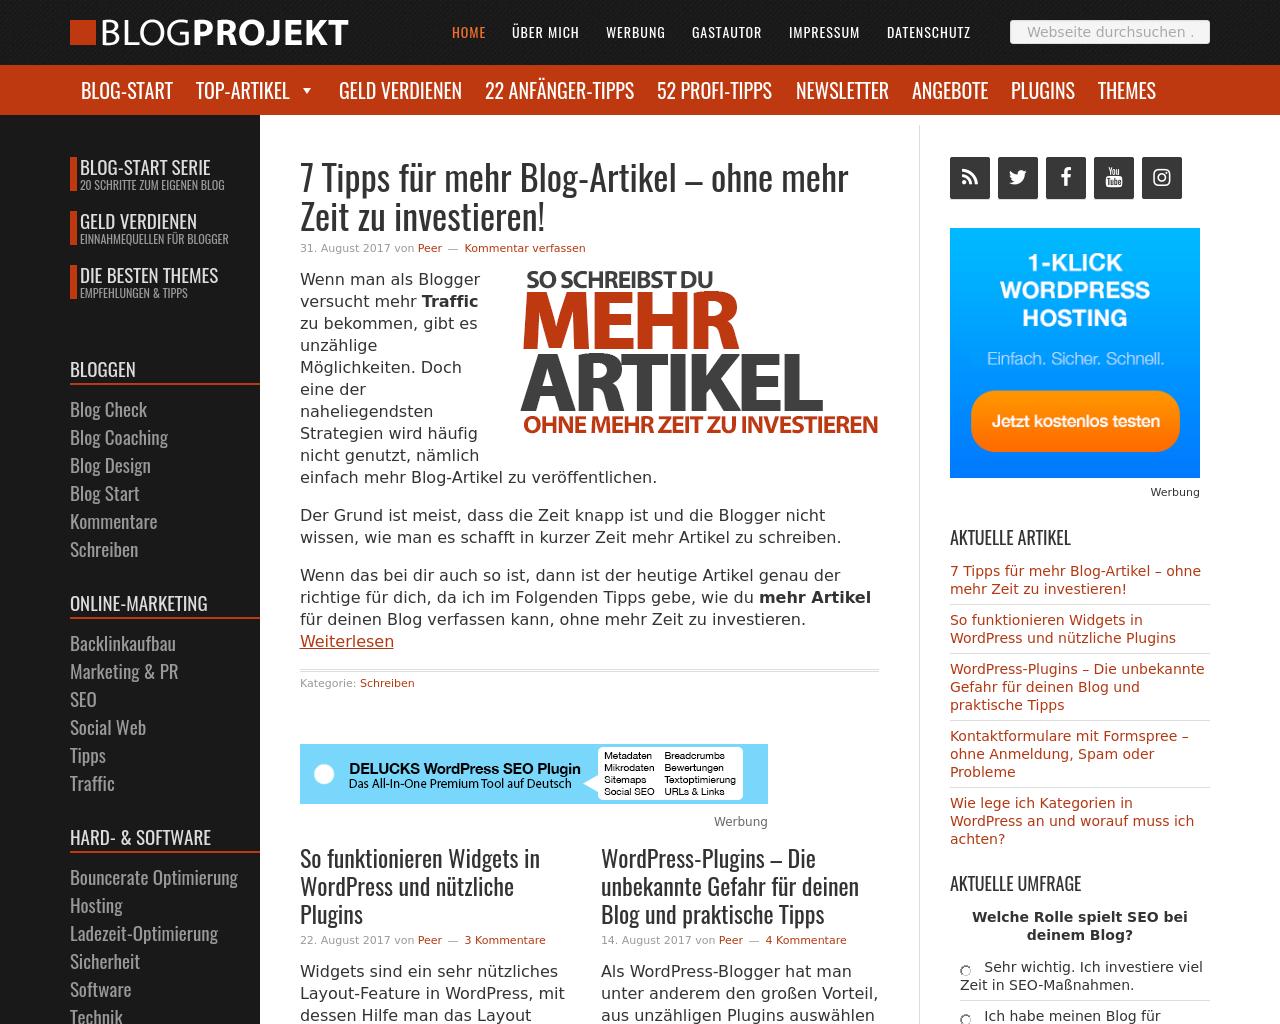 BlogProjekt-Advertising-Reviews-Pricing